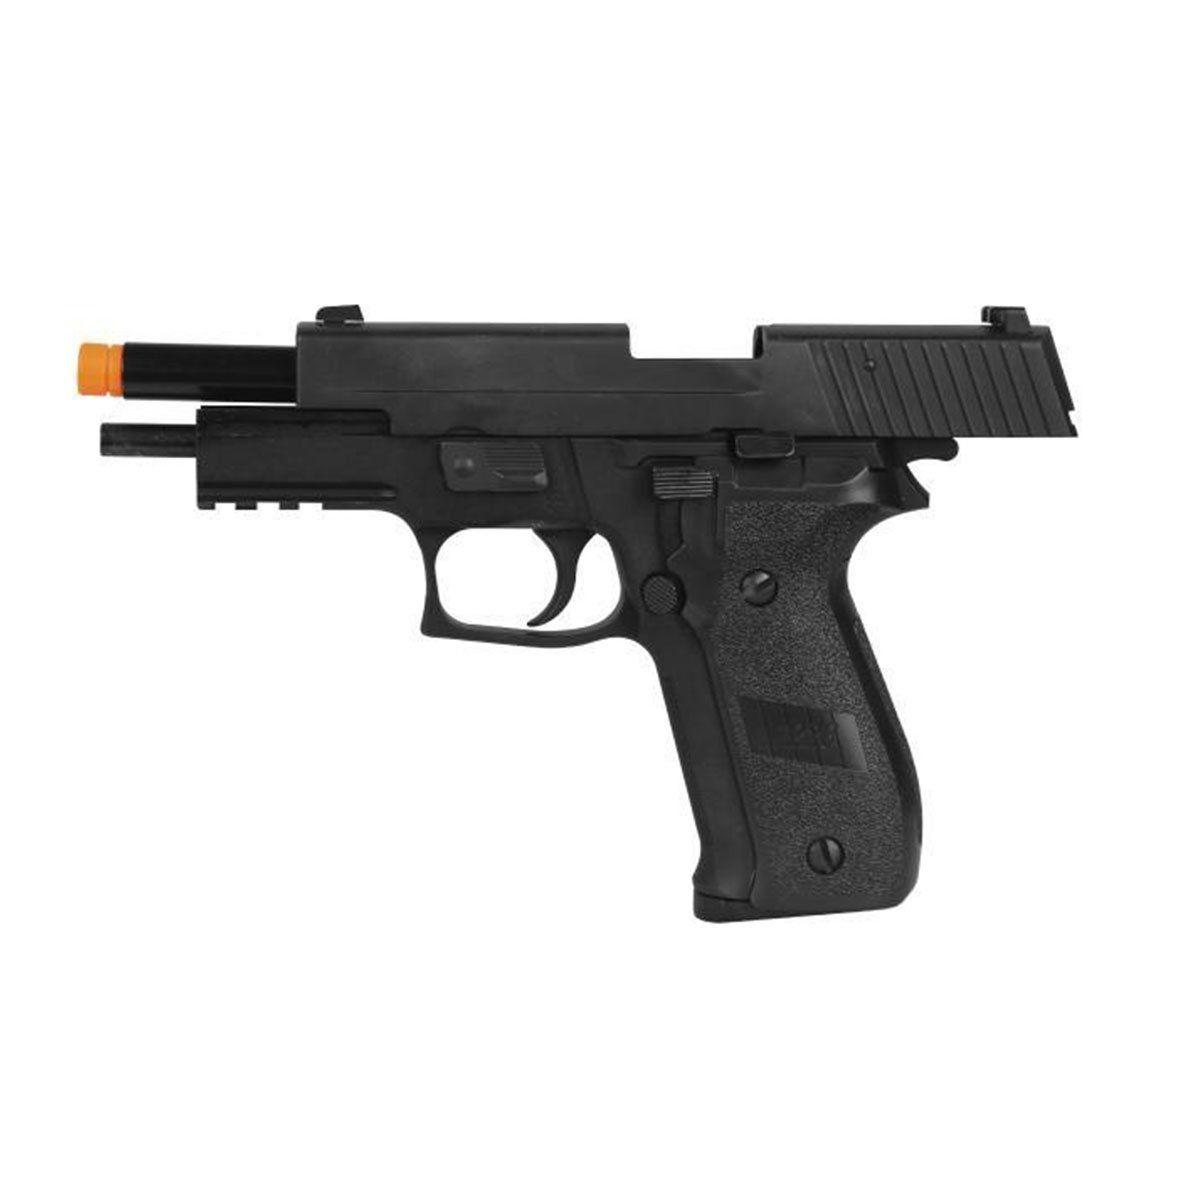 Pistola de Airsoft WE F226 Full Metal GBB NBB 6mm